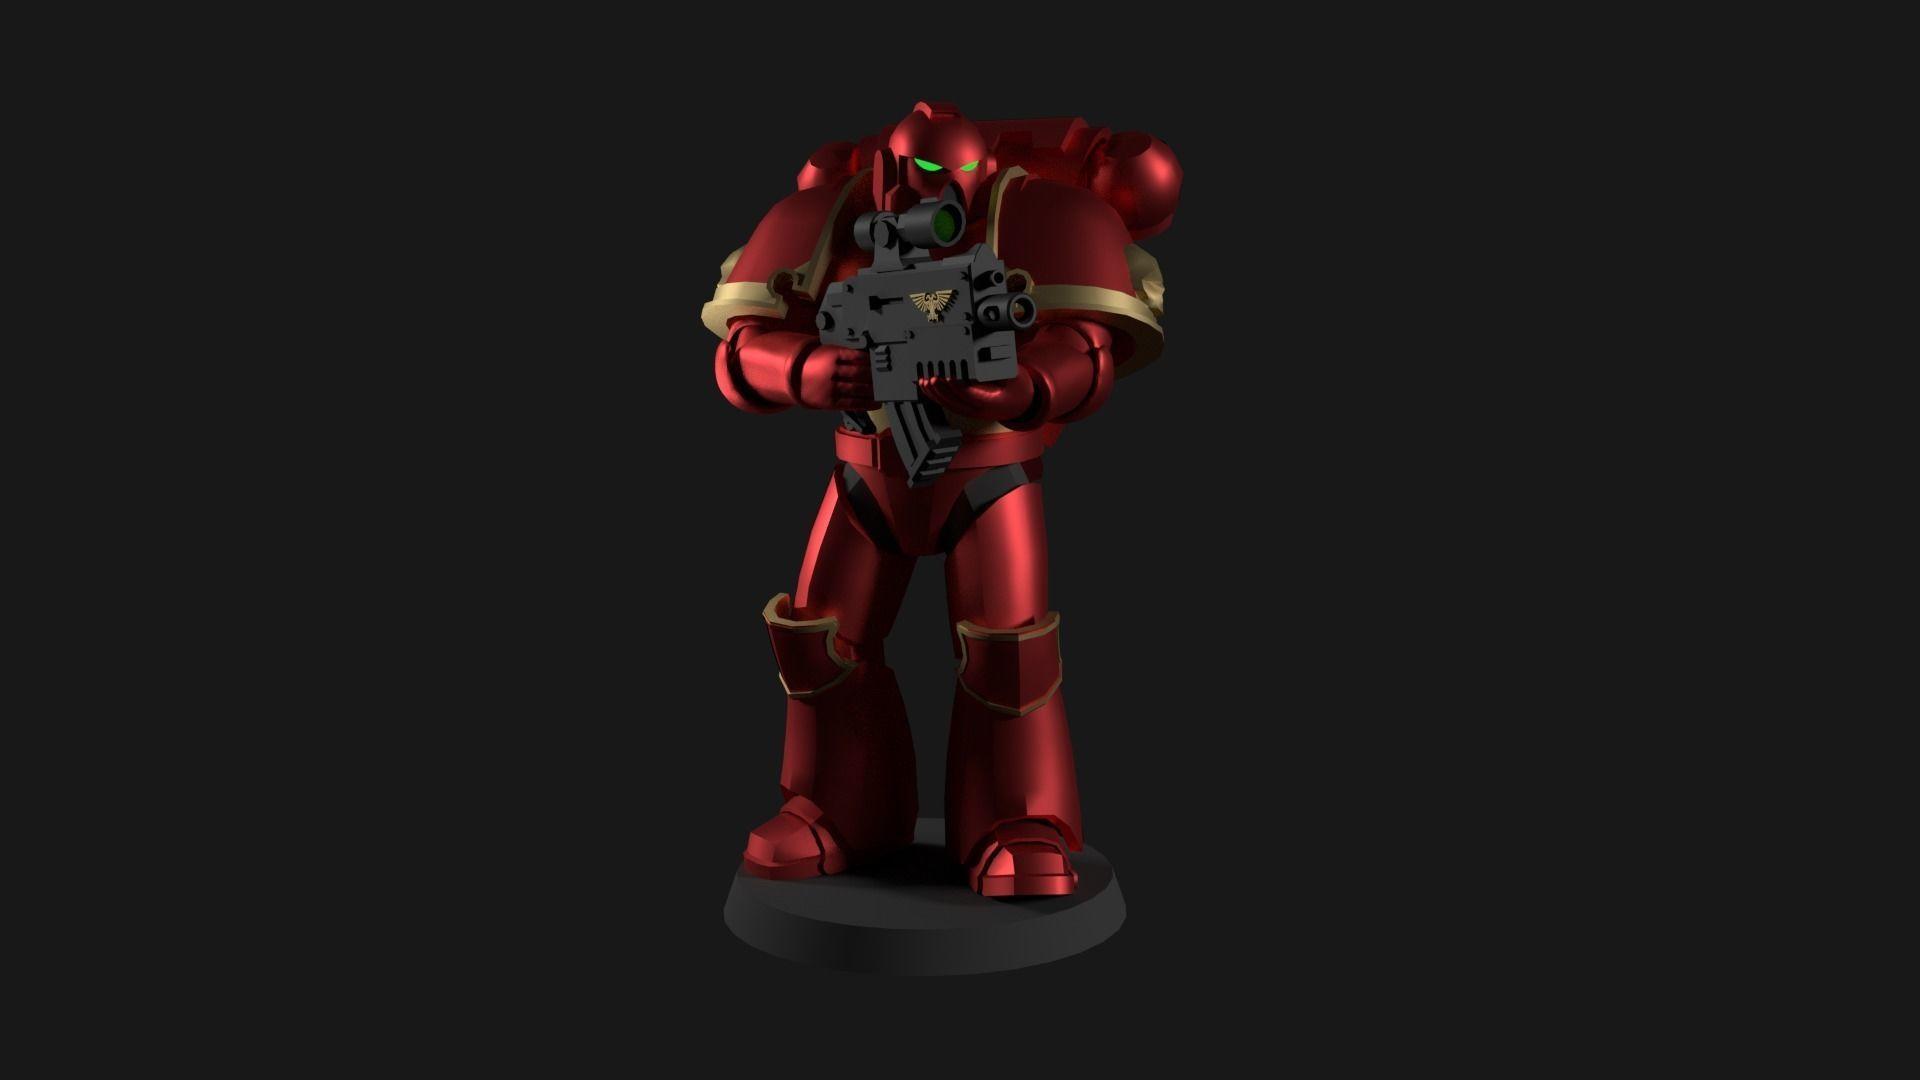 Space Marine Miniature Warhammer 40k | 3D Print Model